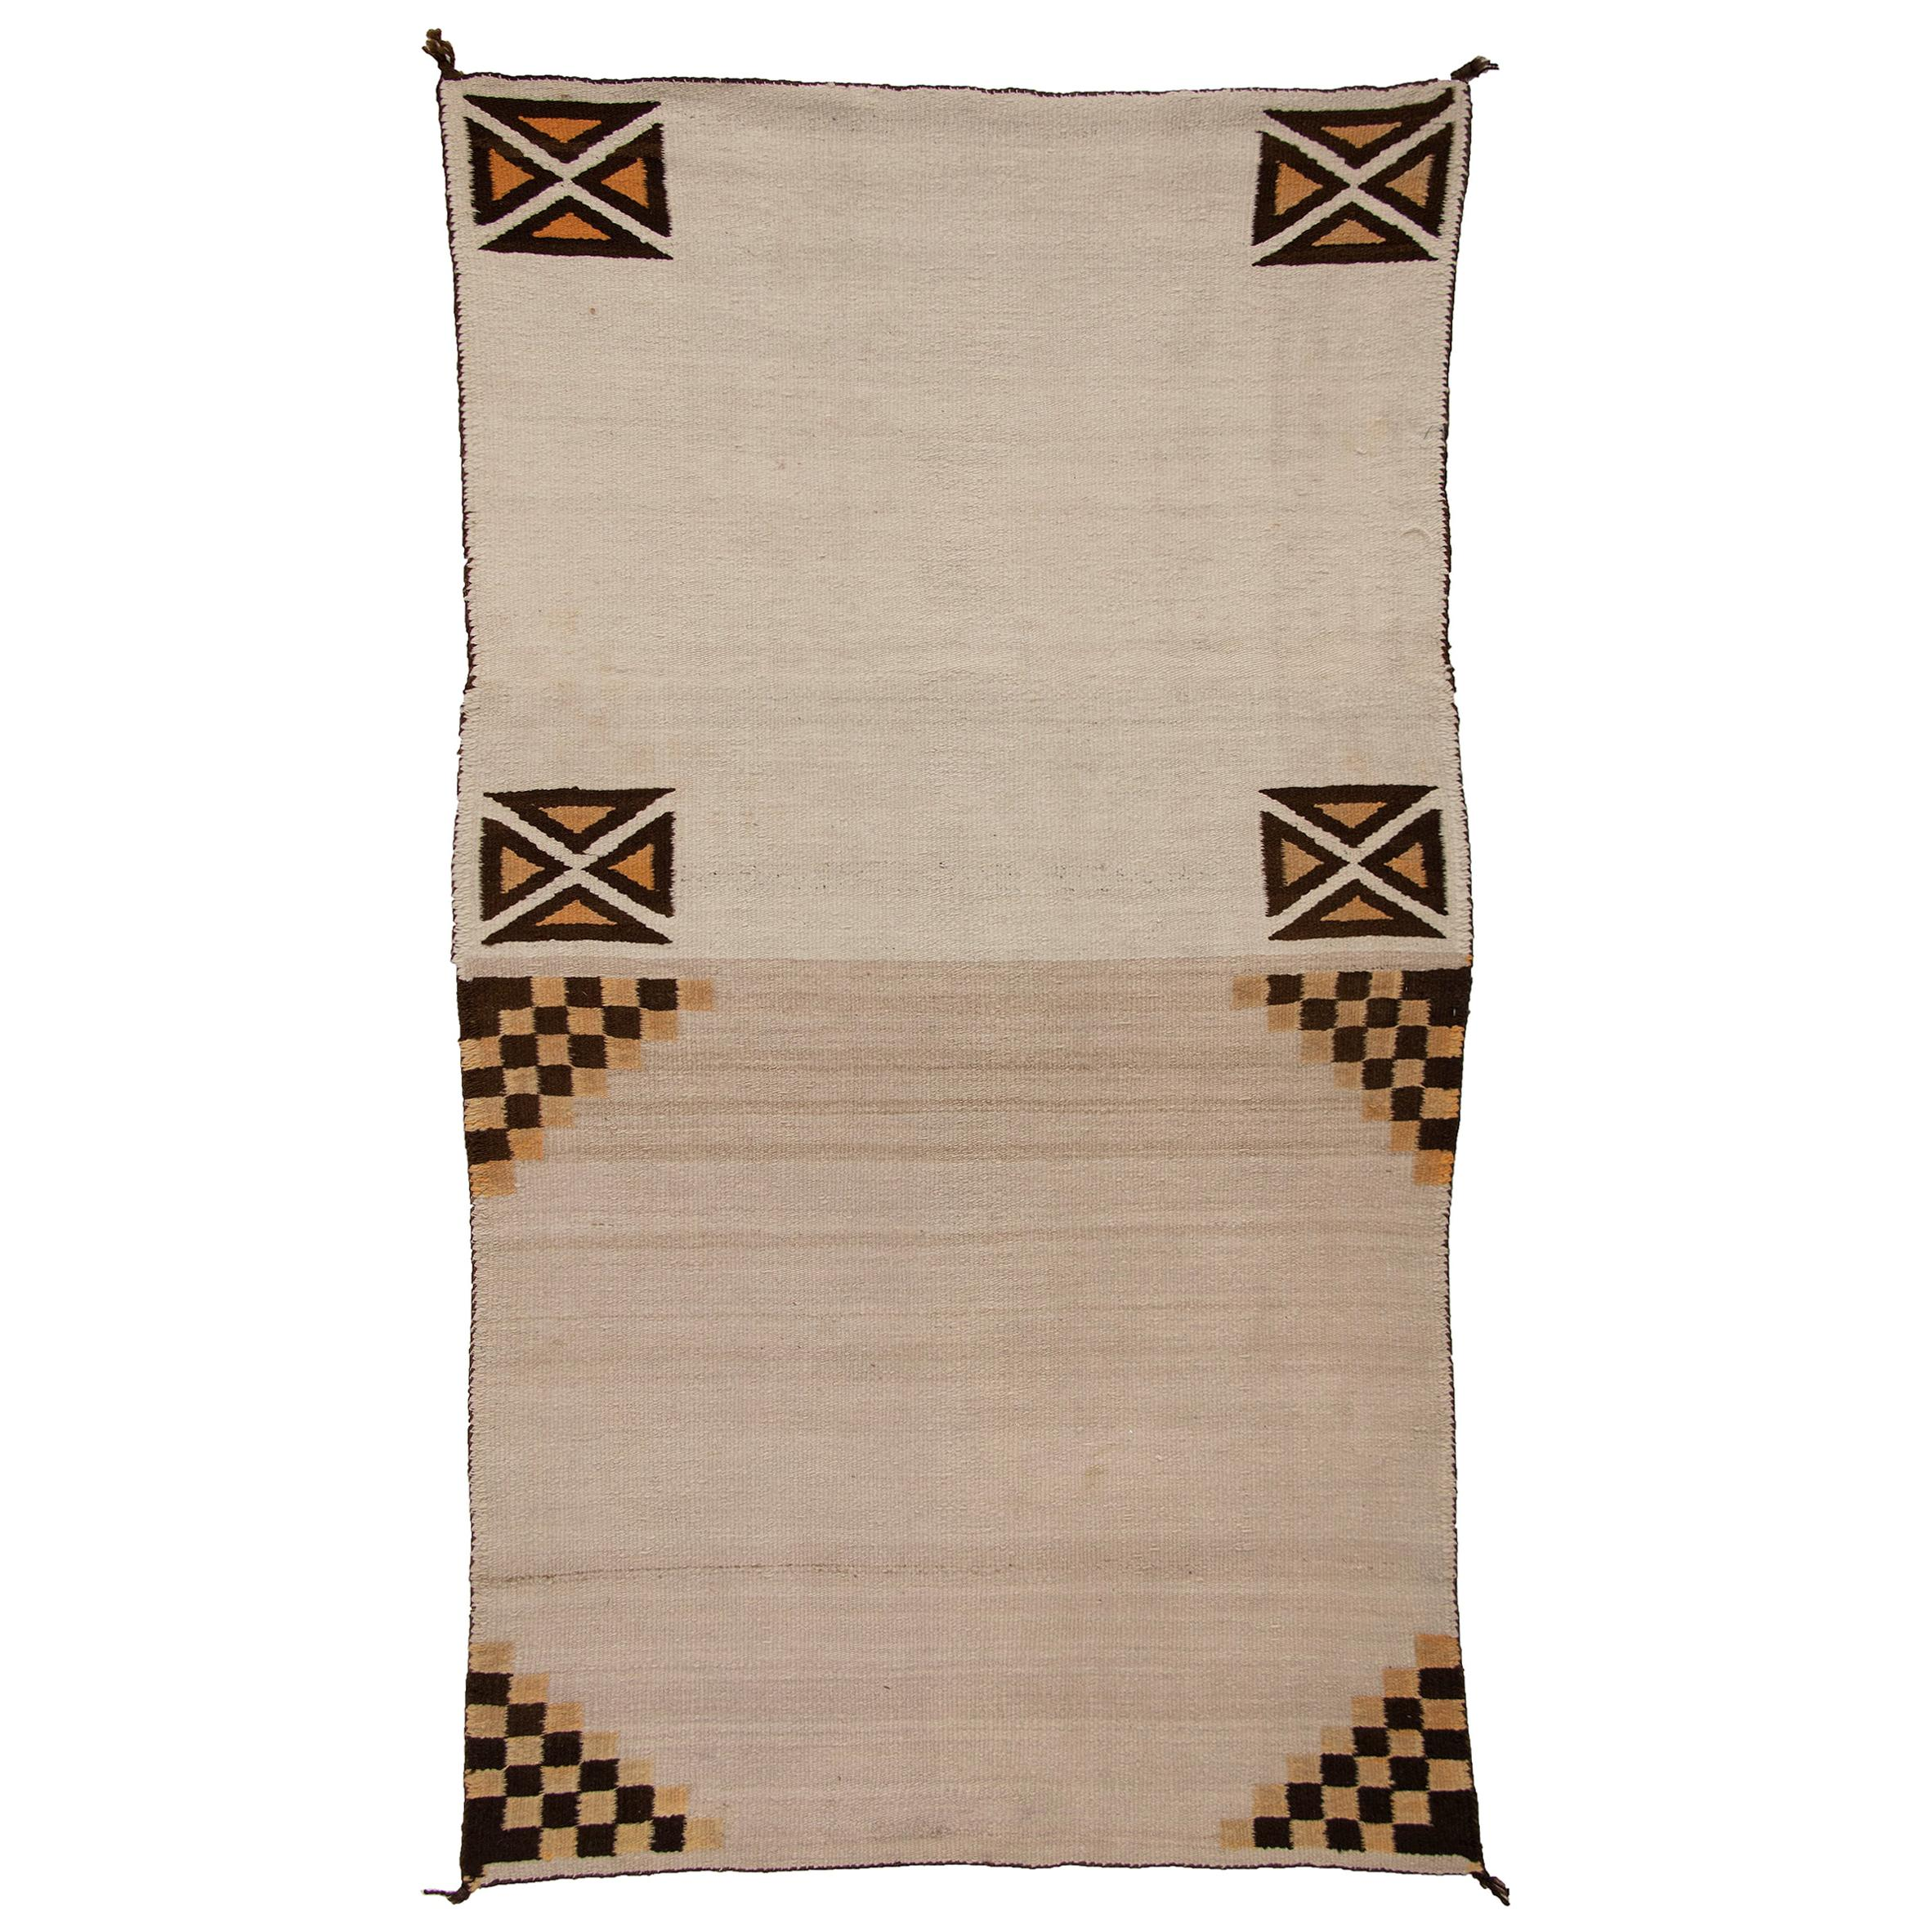 Vintage Navajo Rug Double Saddle Blanket, circa 1925, Ivory/Cream, Black, Orange